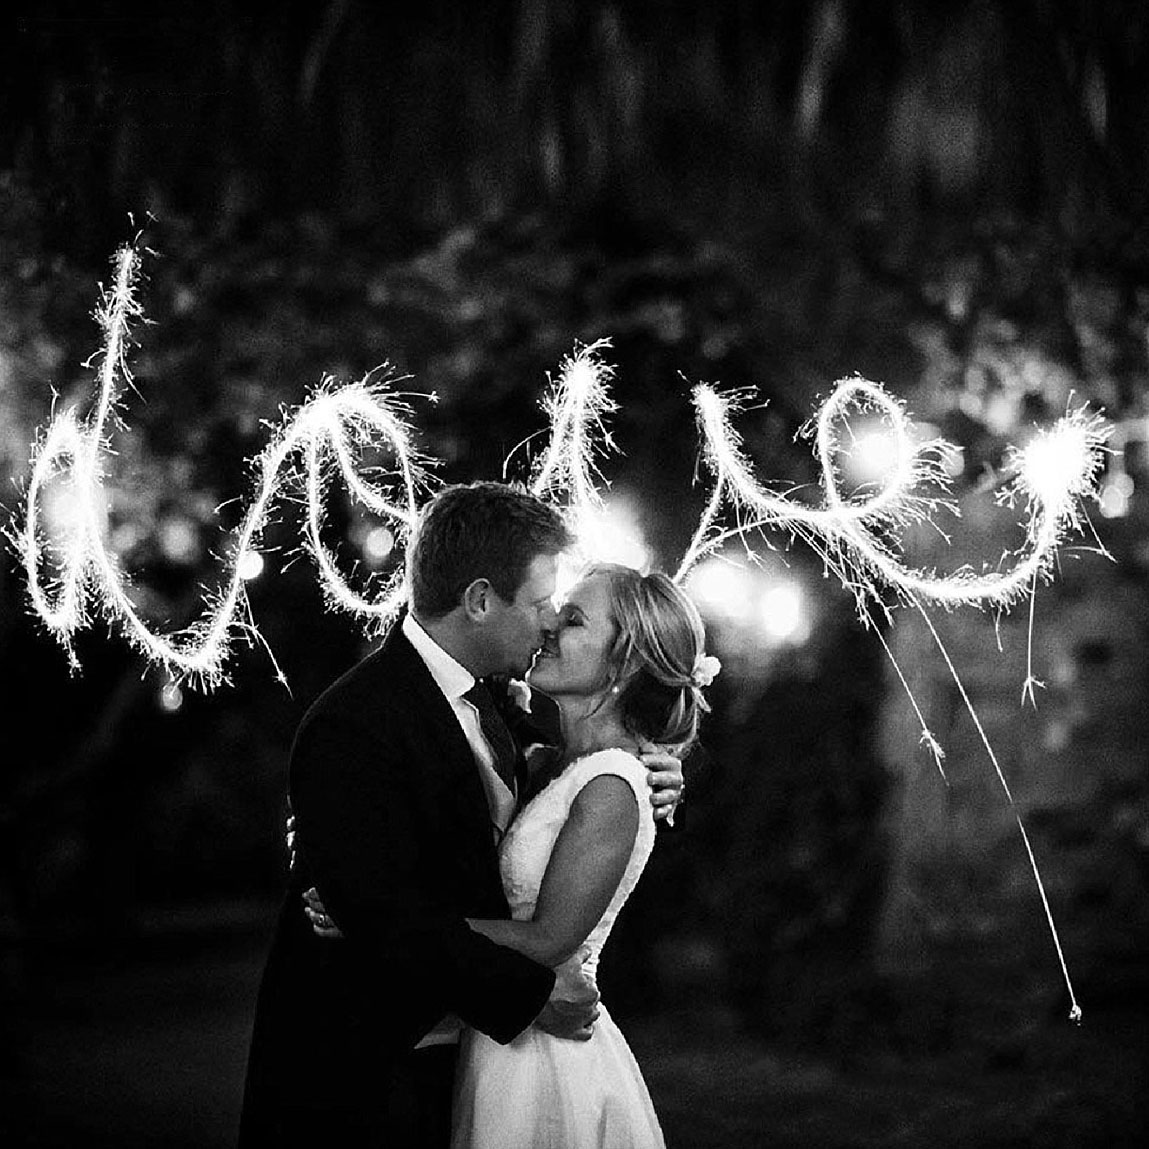 rossington hall wedding photography.jpg